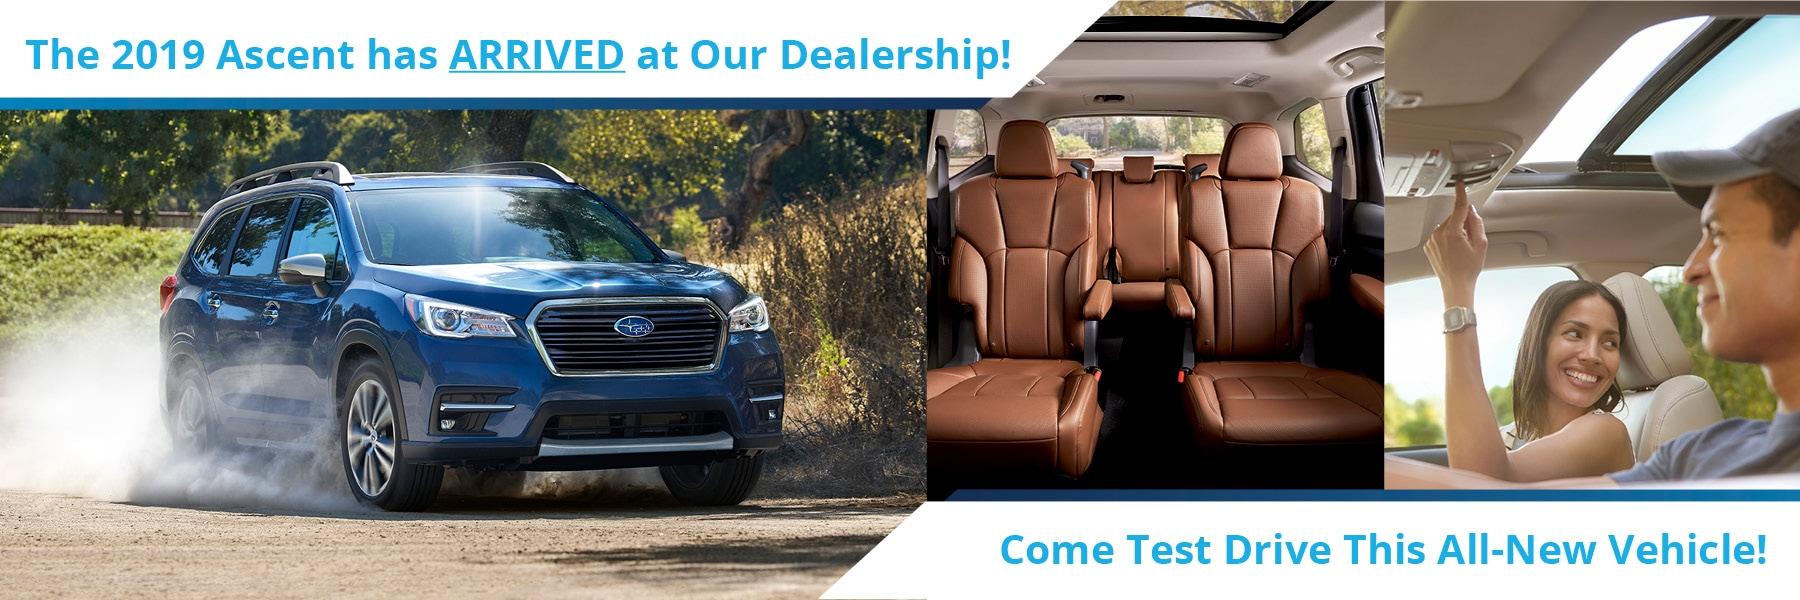 New & Used Subaru Dealer in Moon Township | Day Apollo Subaru